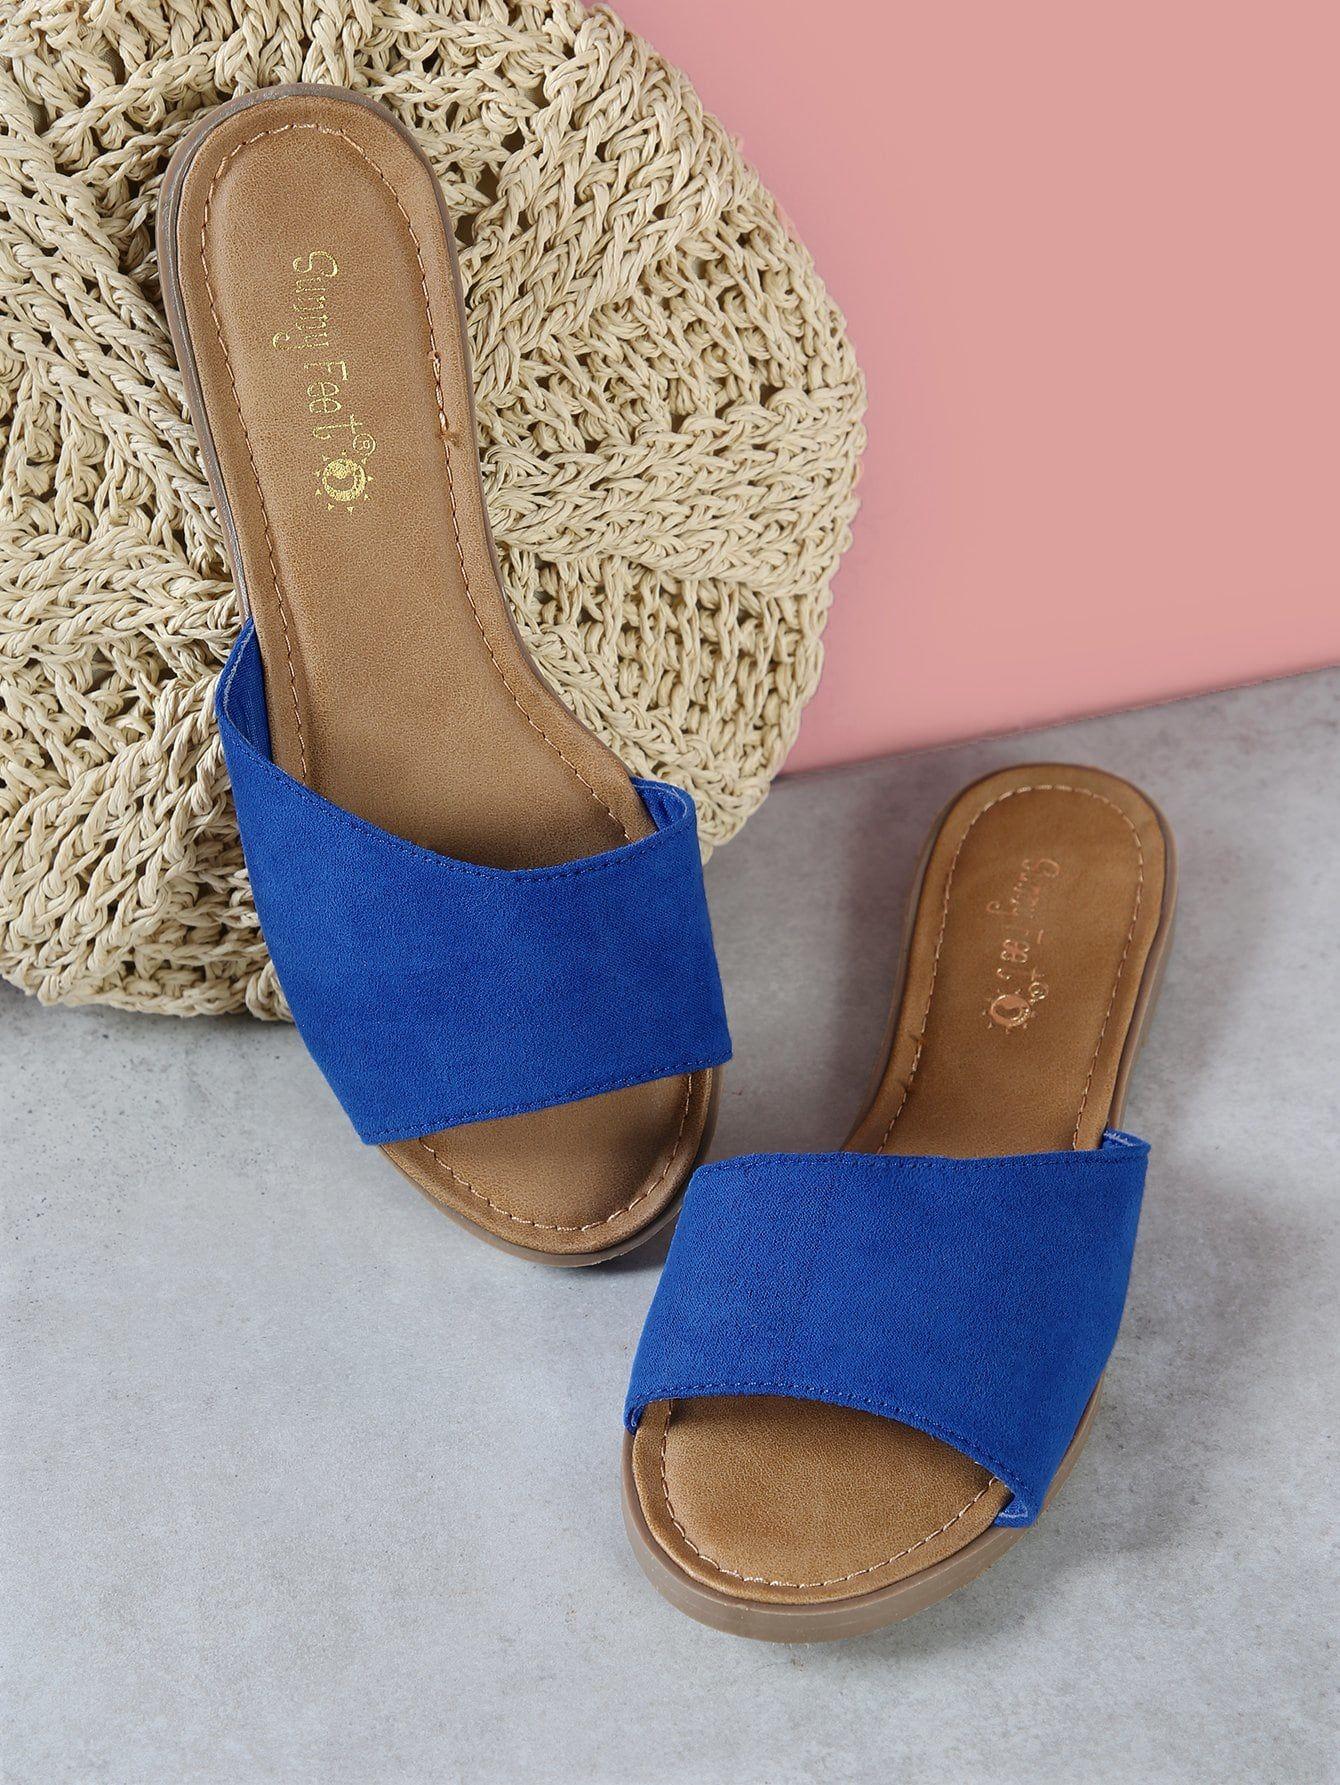 db71e7cbdcd3d4 Casual Blue Low Heel Faux Suede Single Band Peep Toe Slide Sandal ...